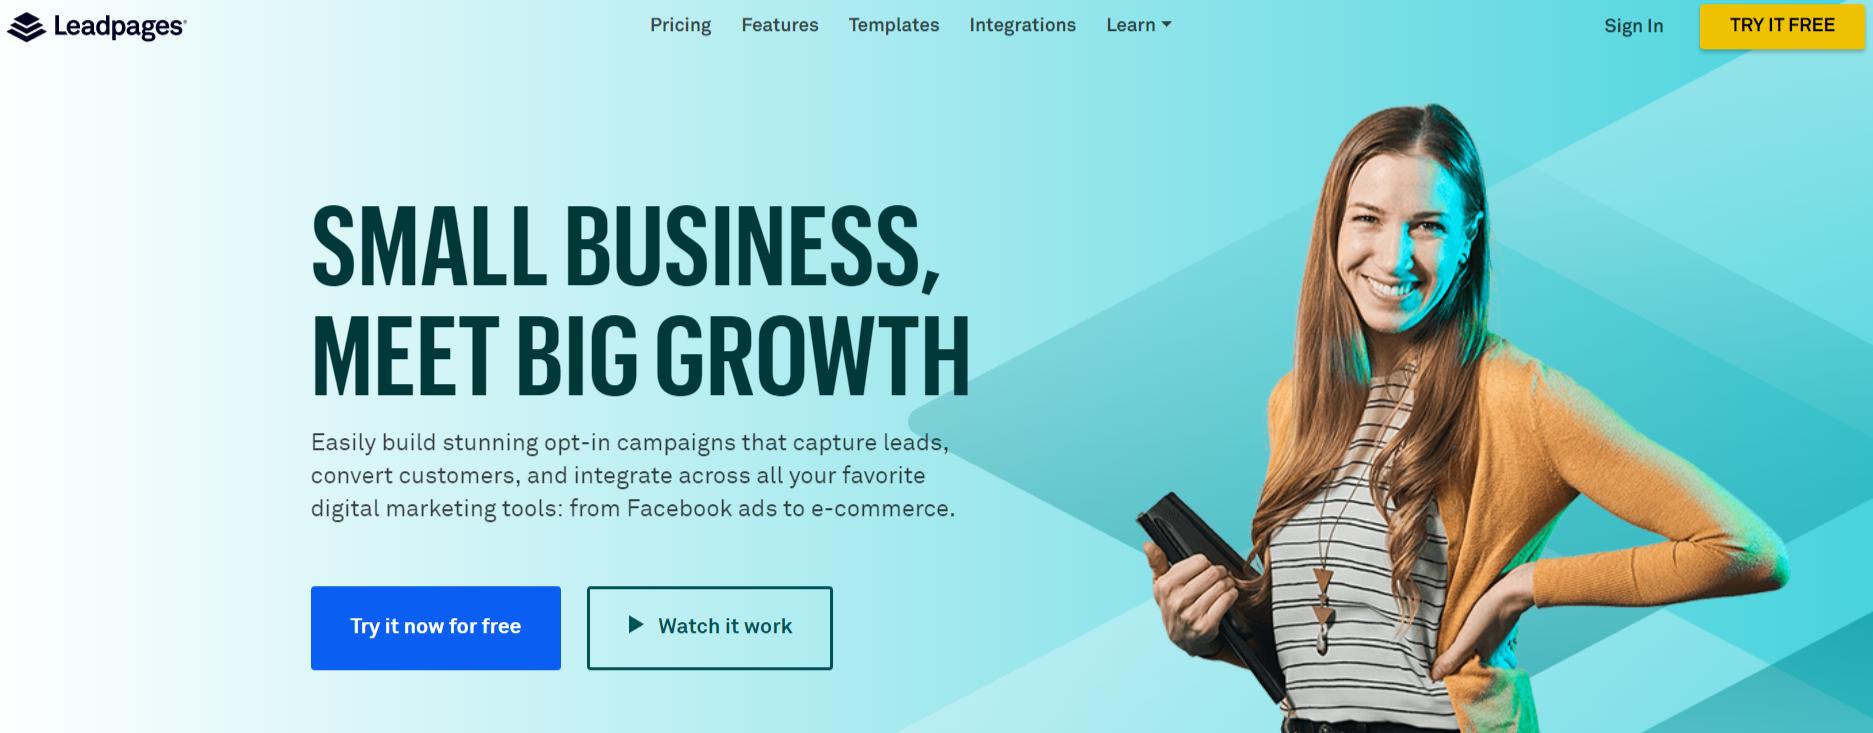 Leadpages®- WordPress Email Marketing Plugins